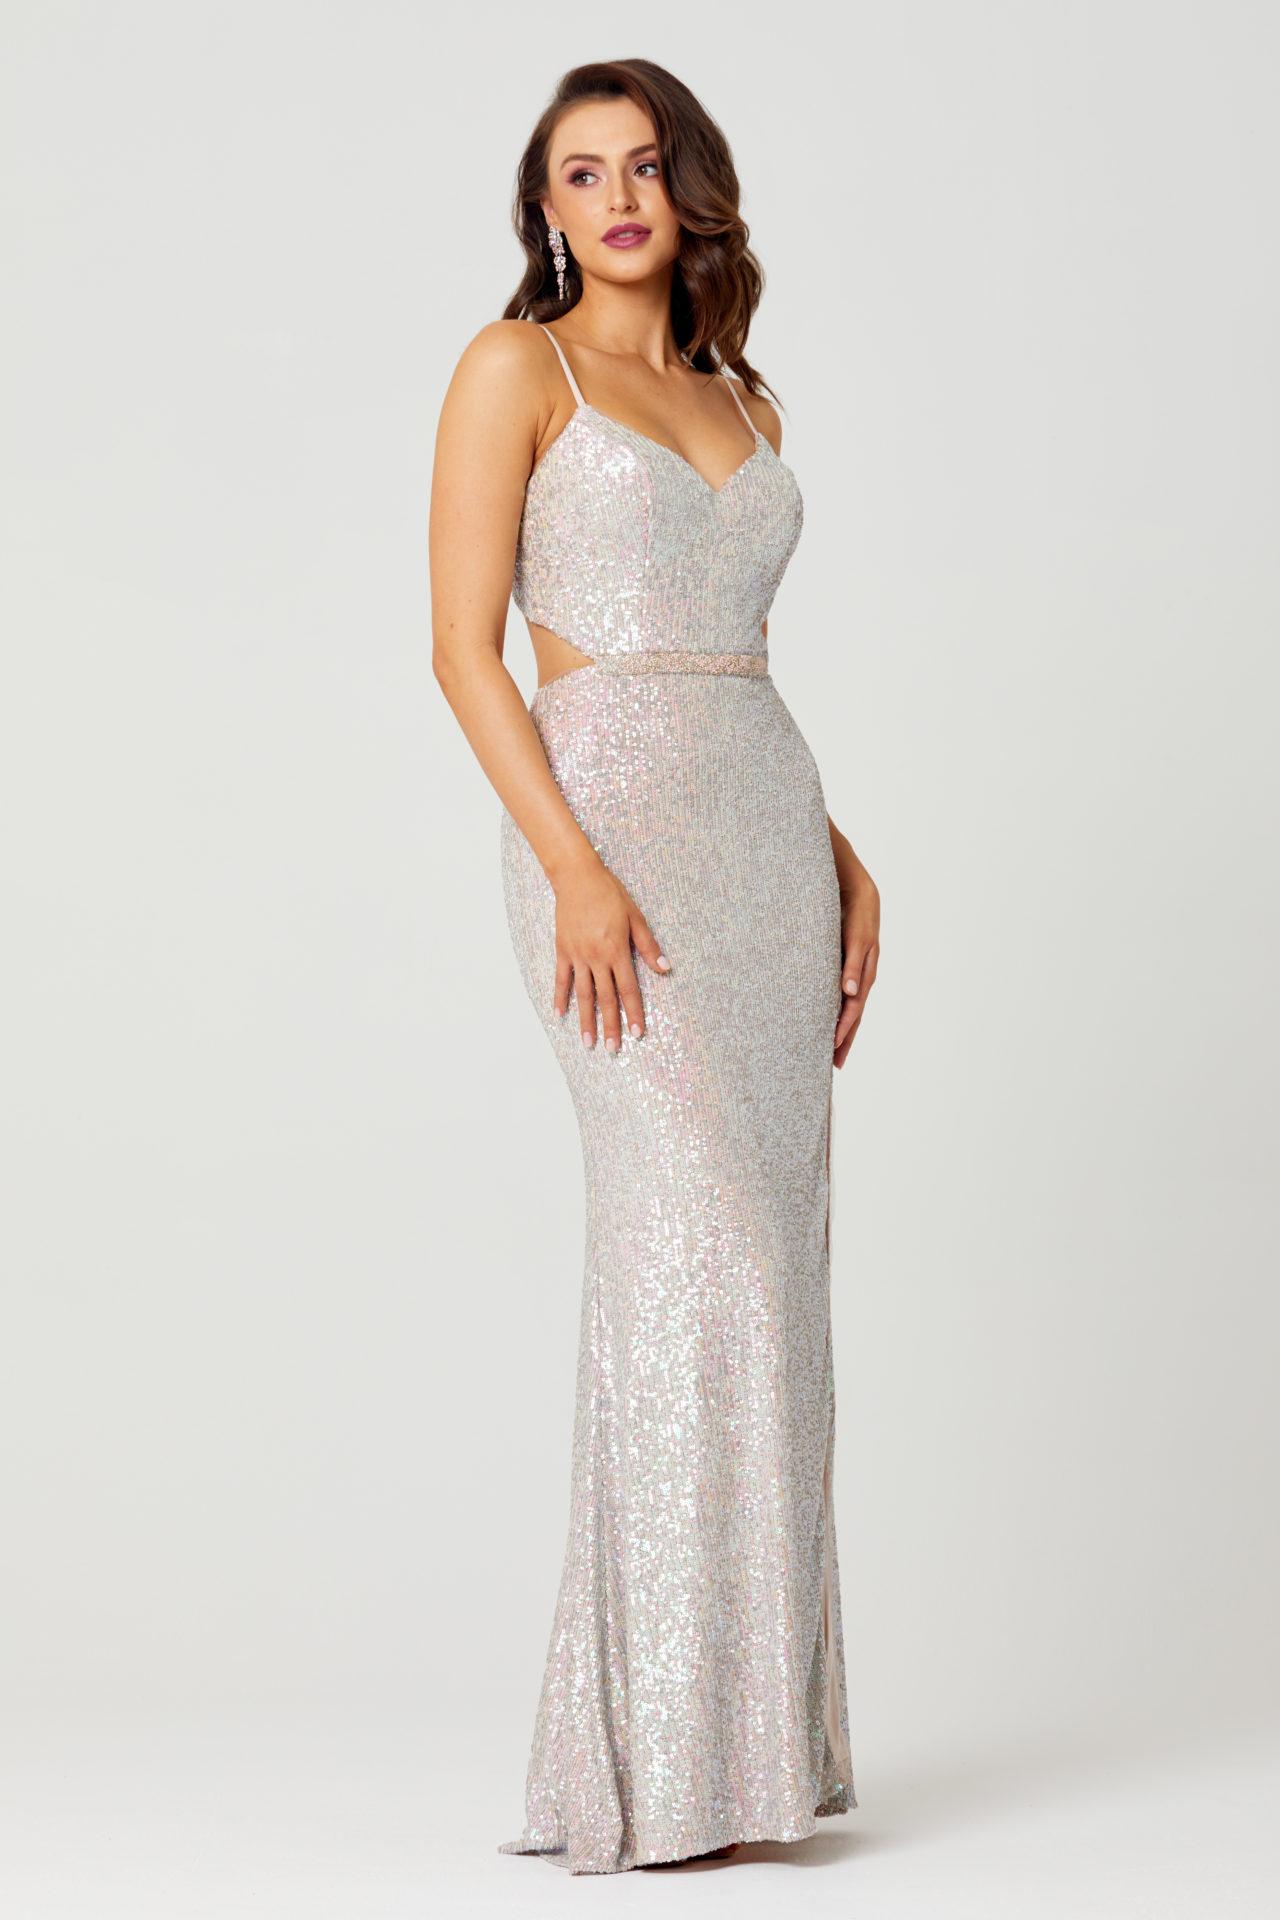 Jasmine Sequin Formal Dress PO853 Side